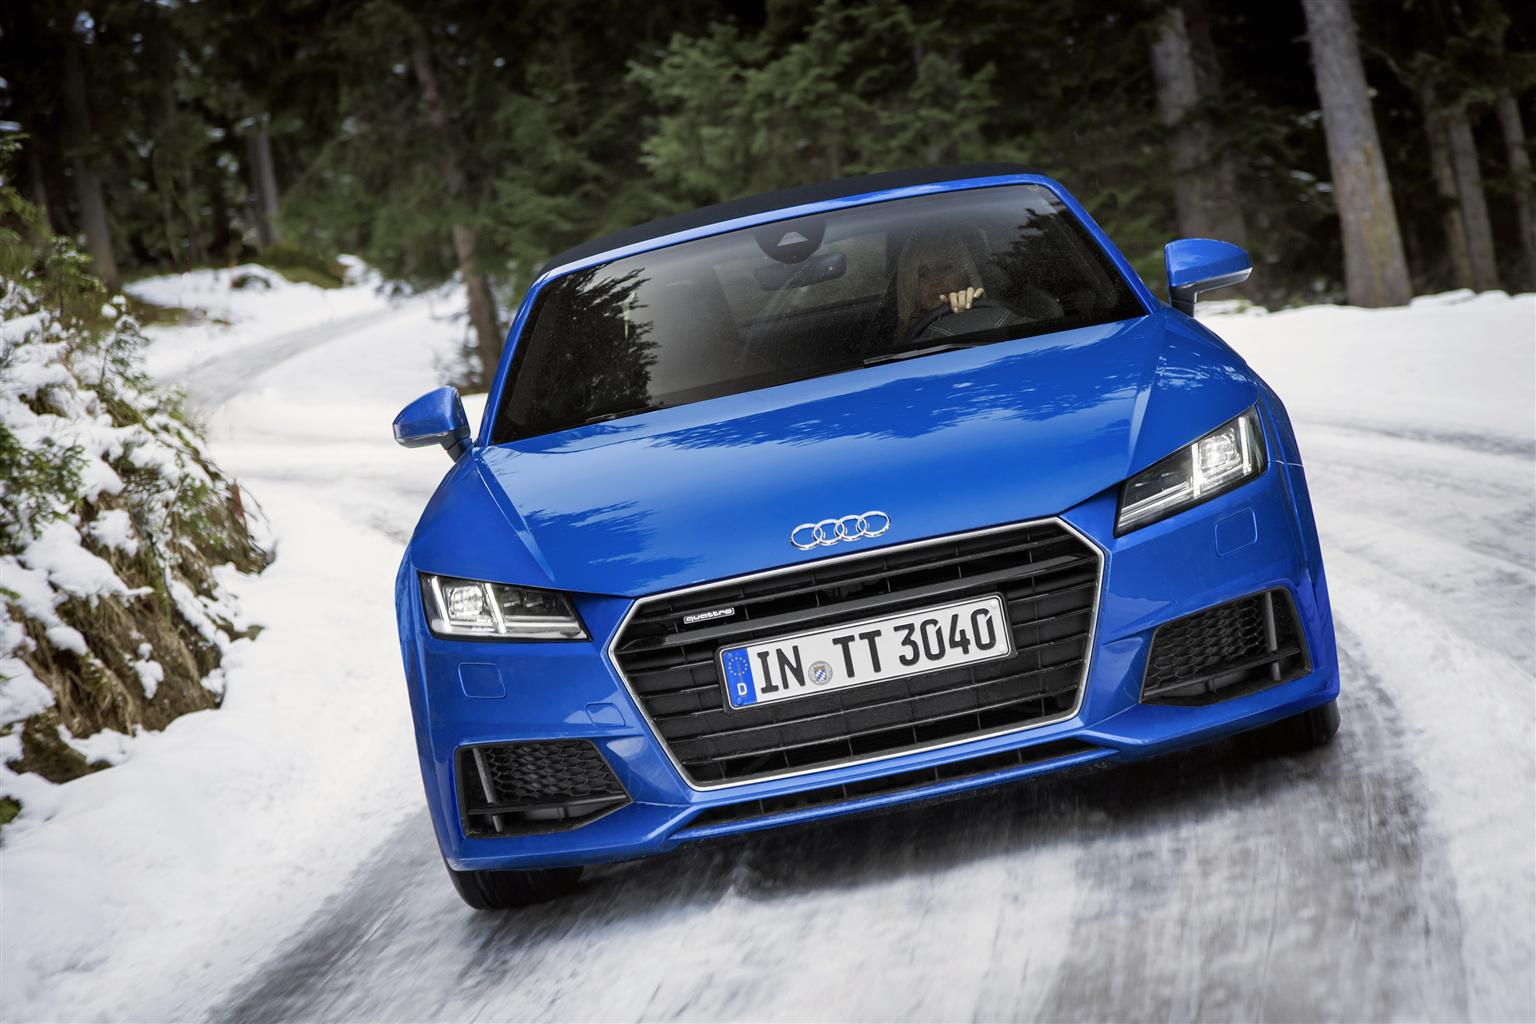 Nuova Audi TT Roadster e TTS Roadster